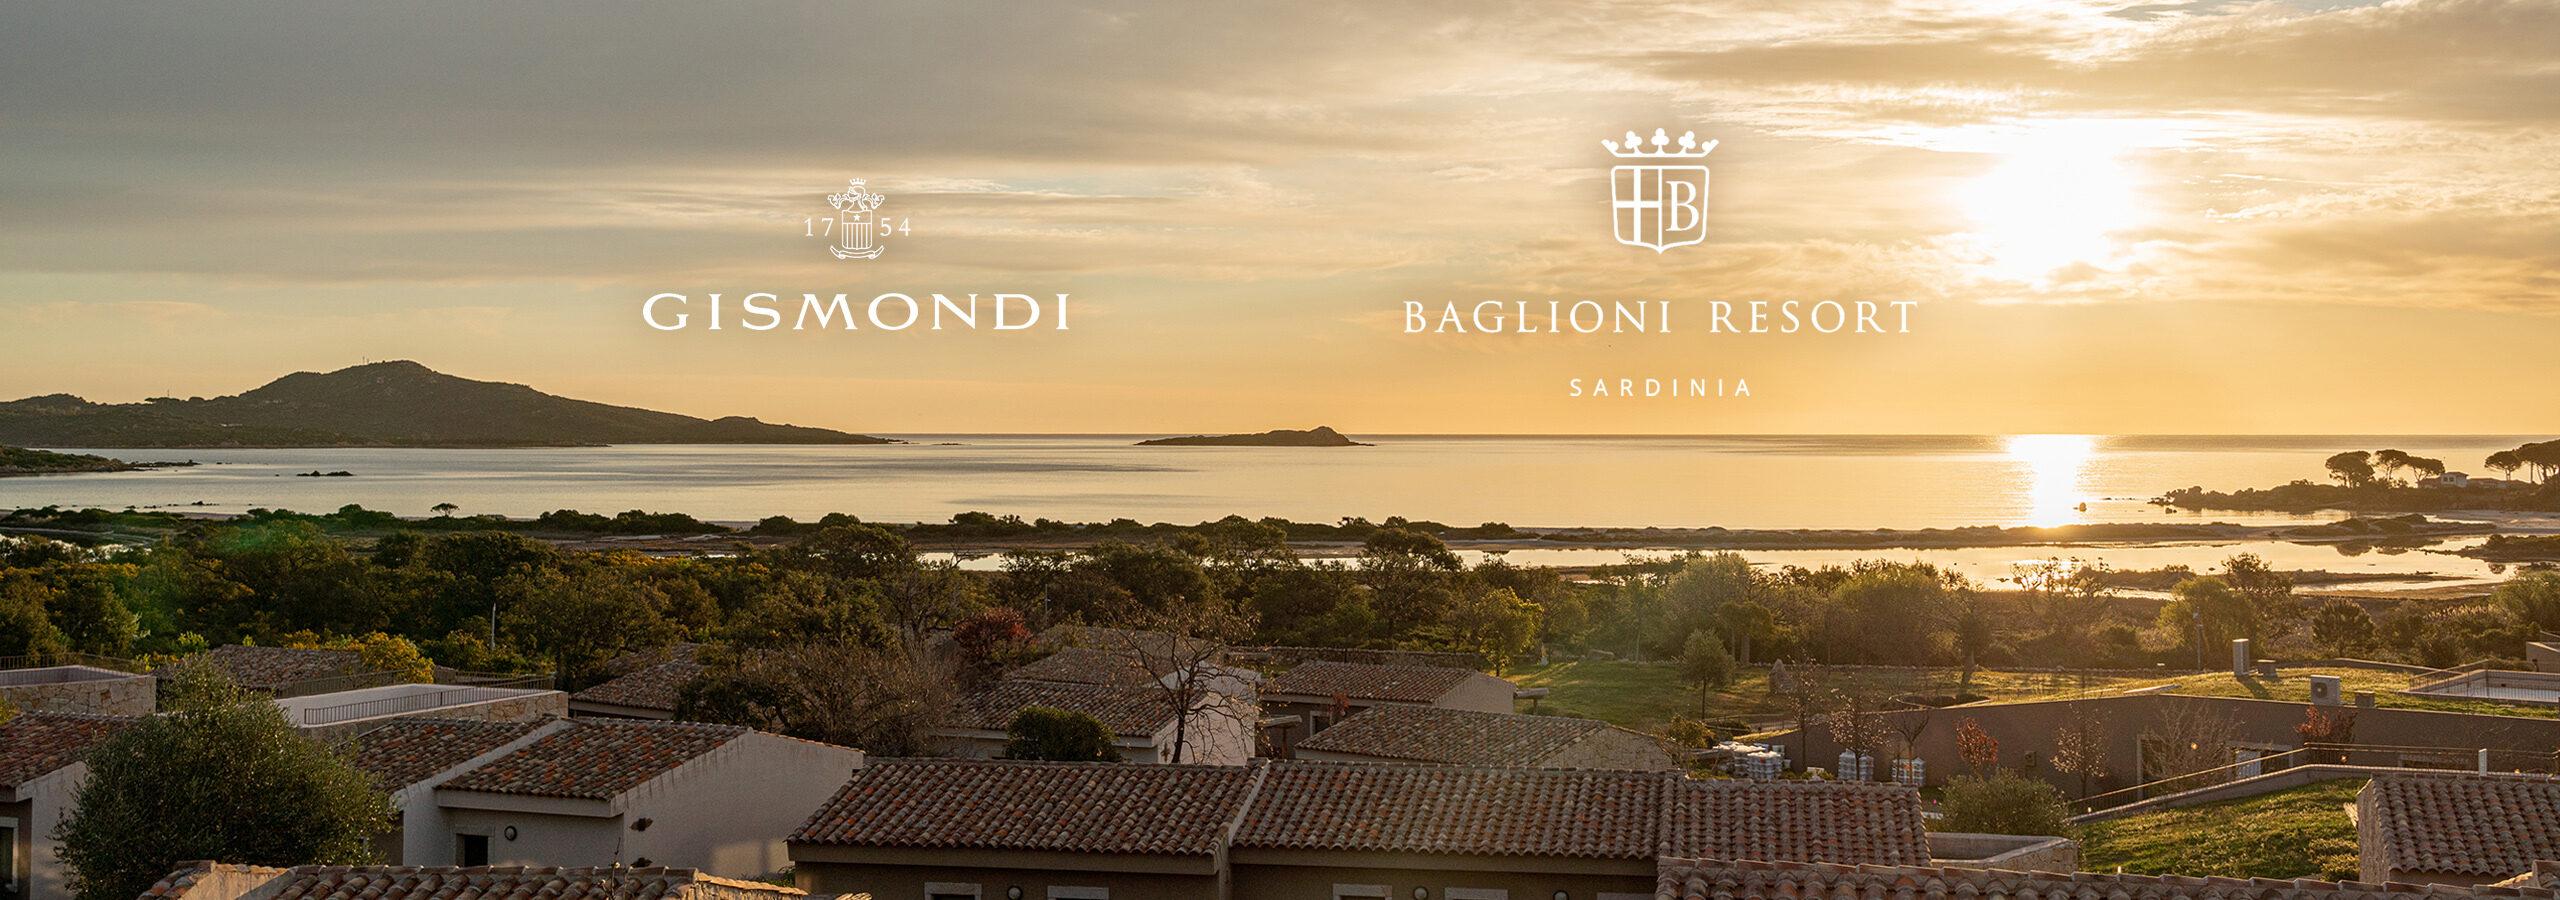 Gismondi1754 agreement baglioni hotels news